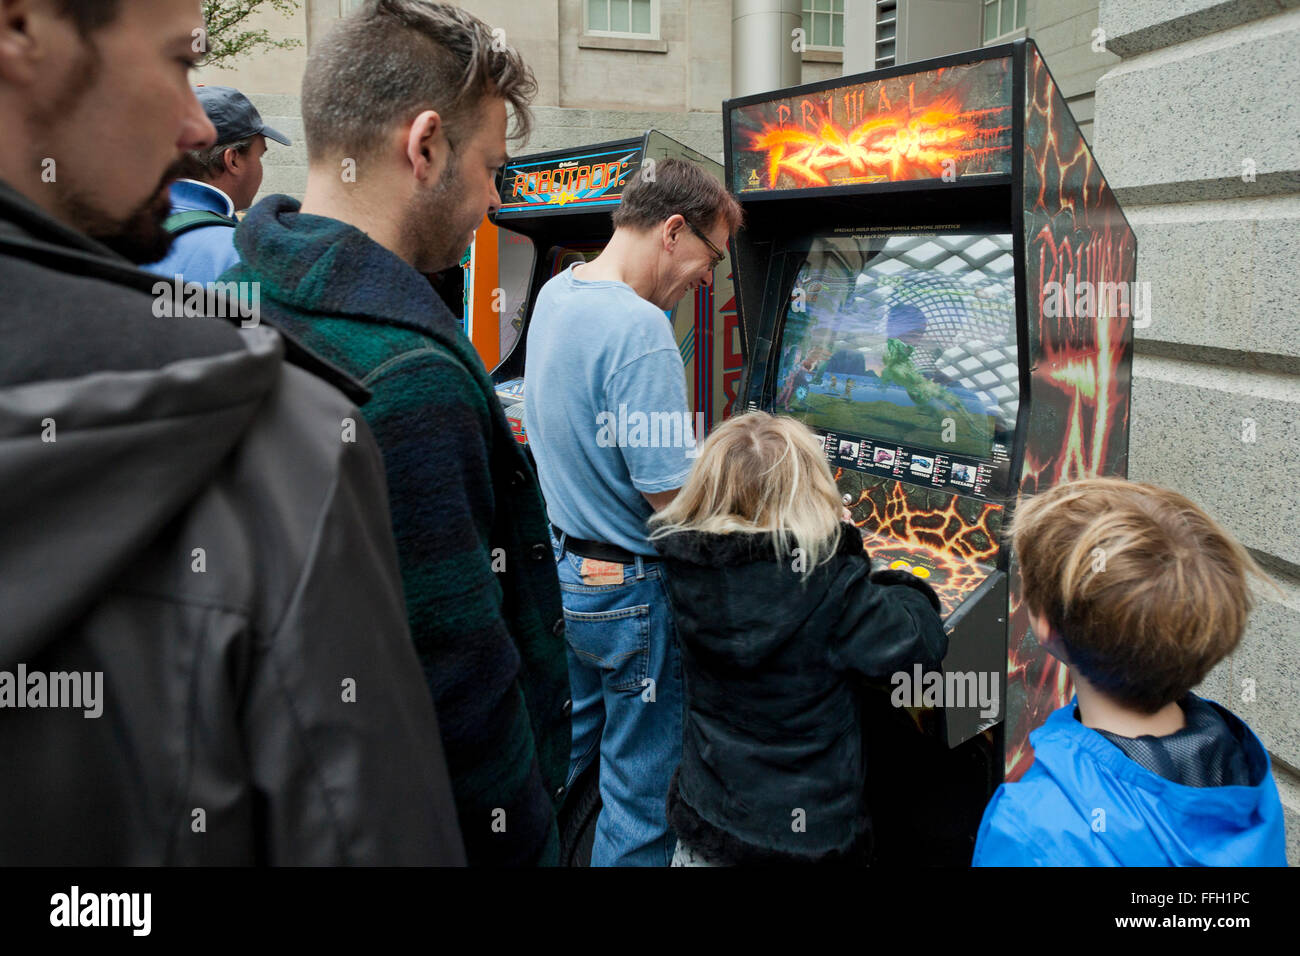 Man playing video game arcade avec fille - USA Photo Stock